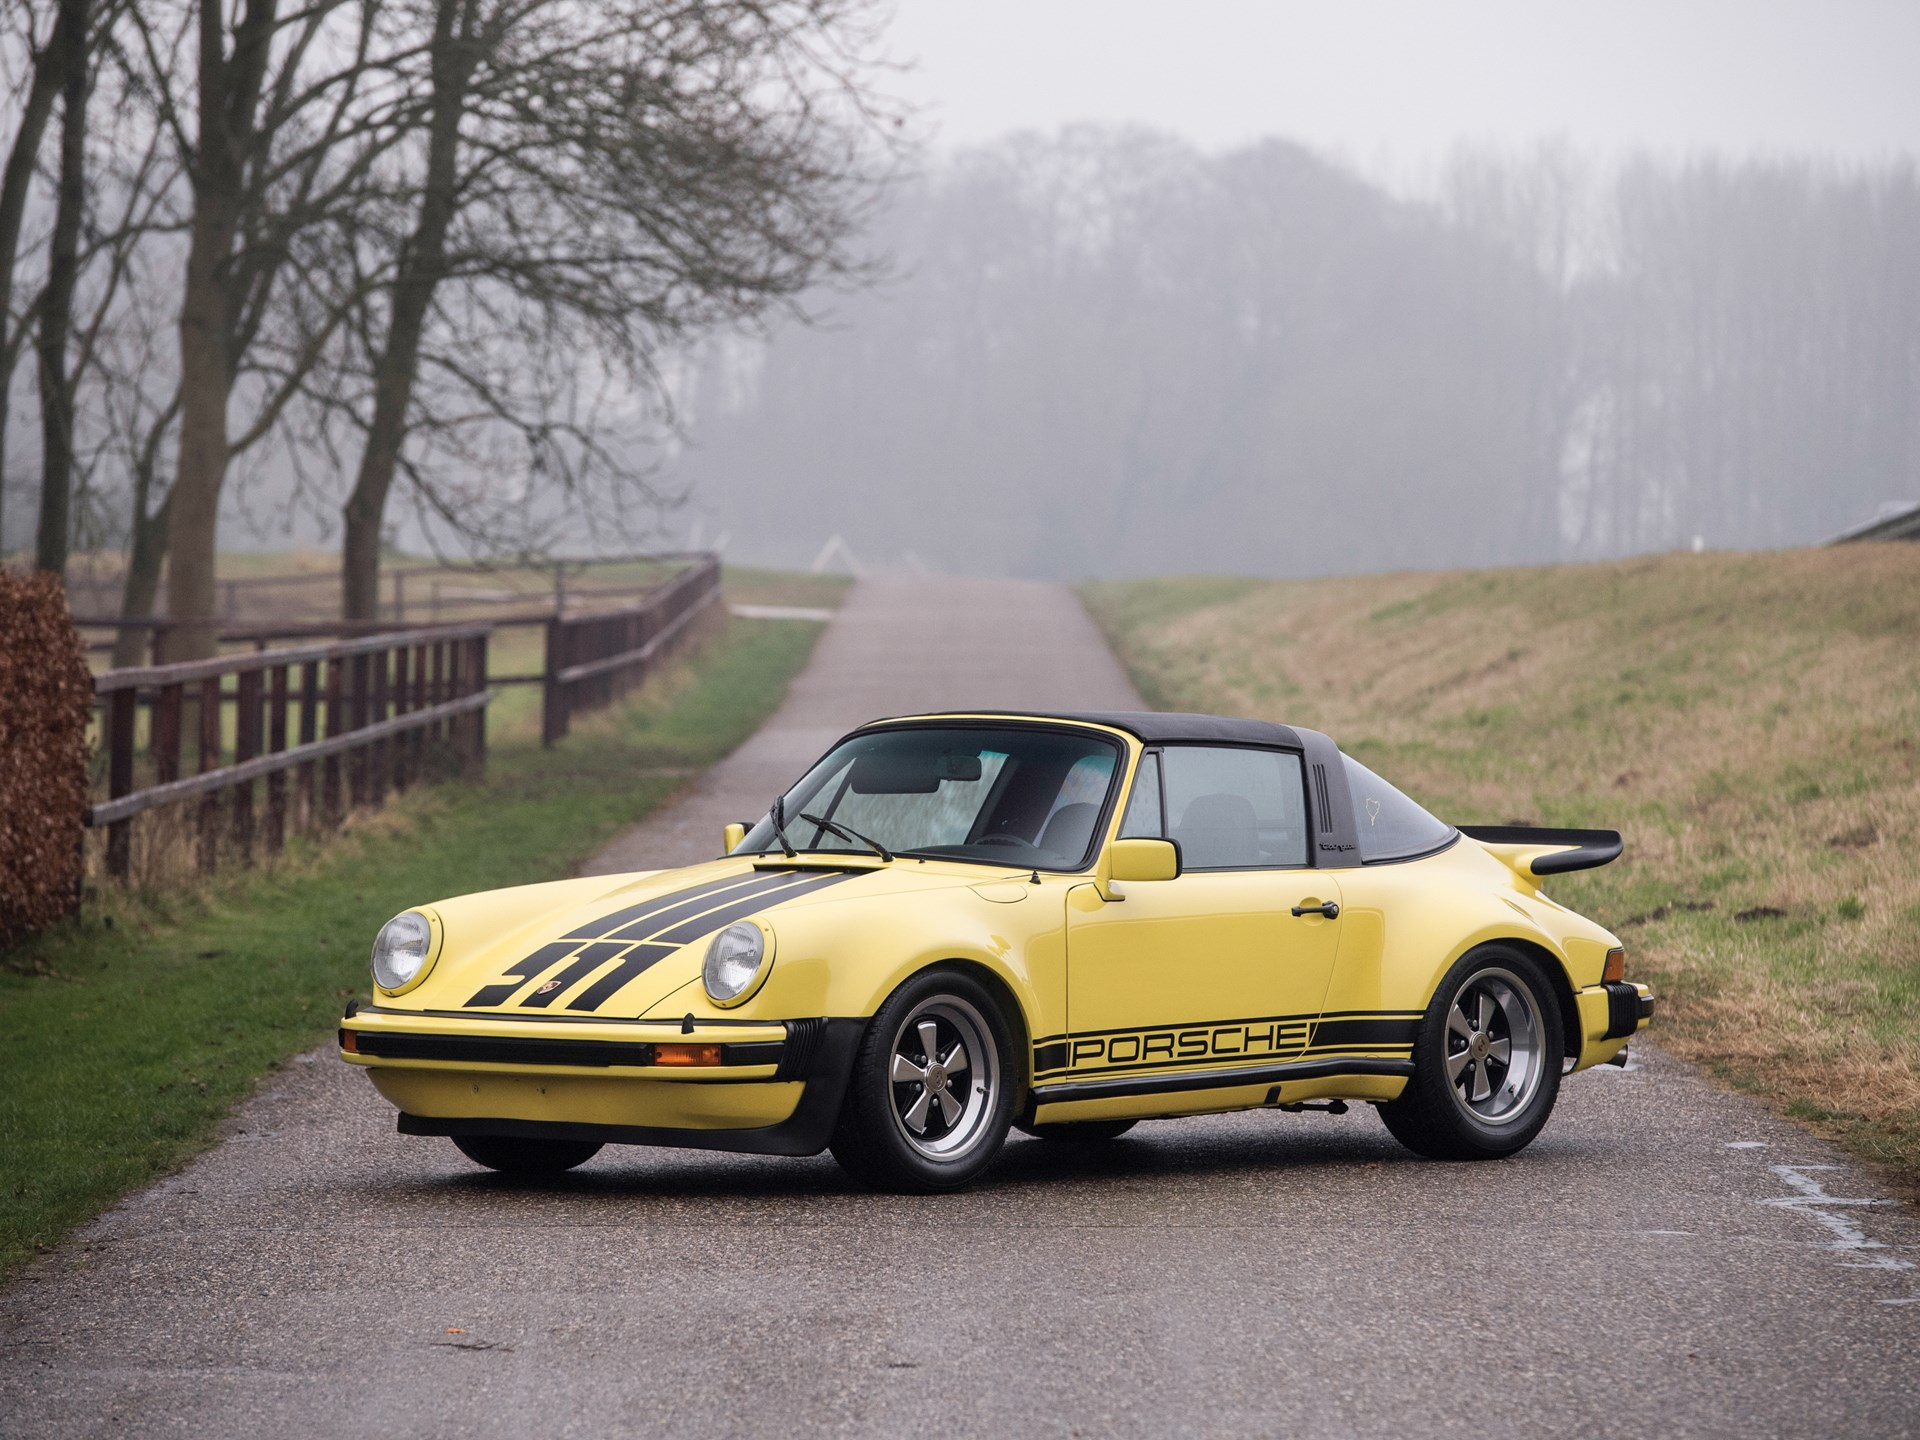 1977 Porsche 911 Carrera 3.0 'Turbo Look' Targa